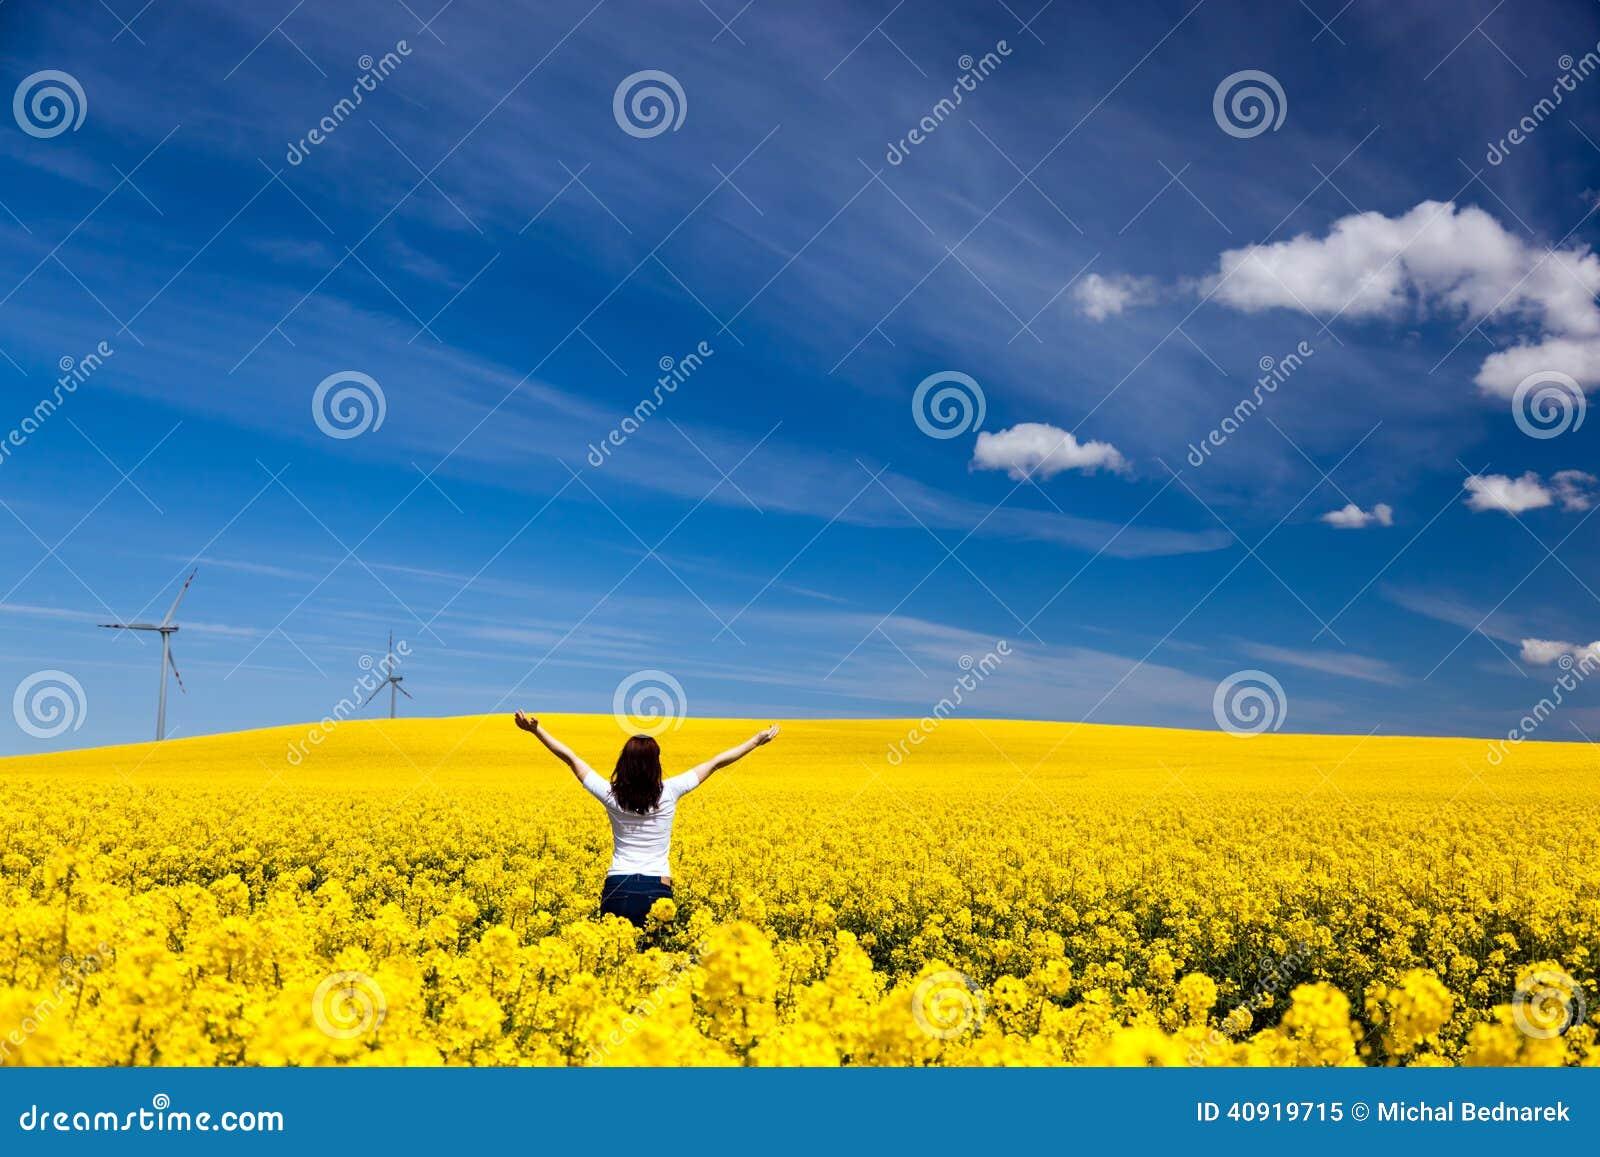 Glückliche junge Frau auf Frühlingsfeld, Ökologie